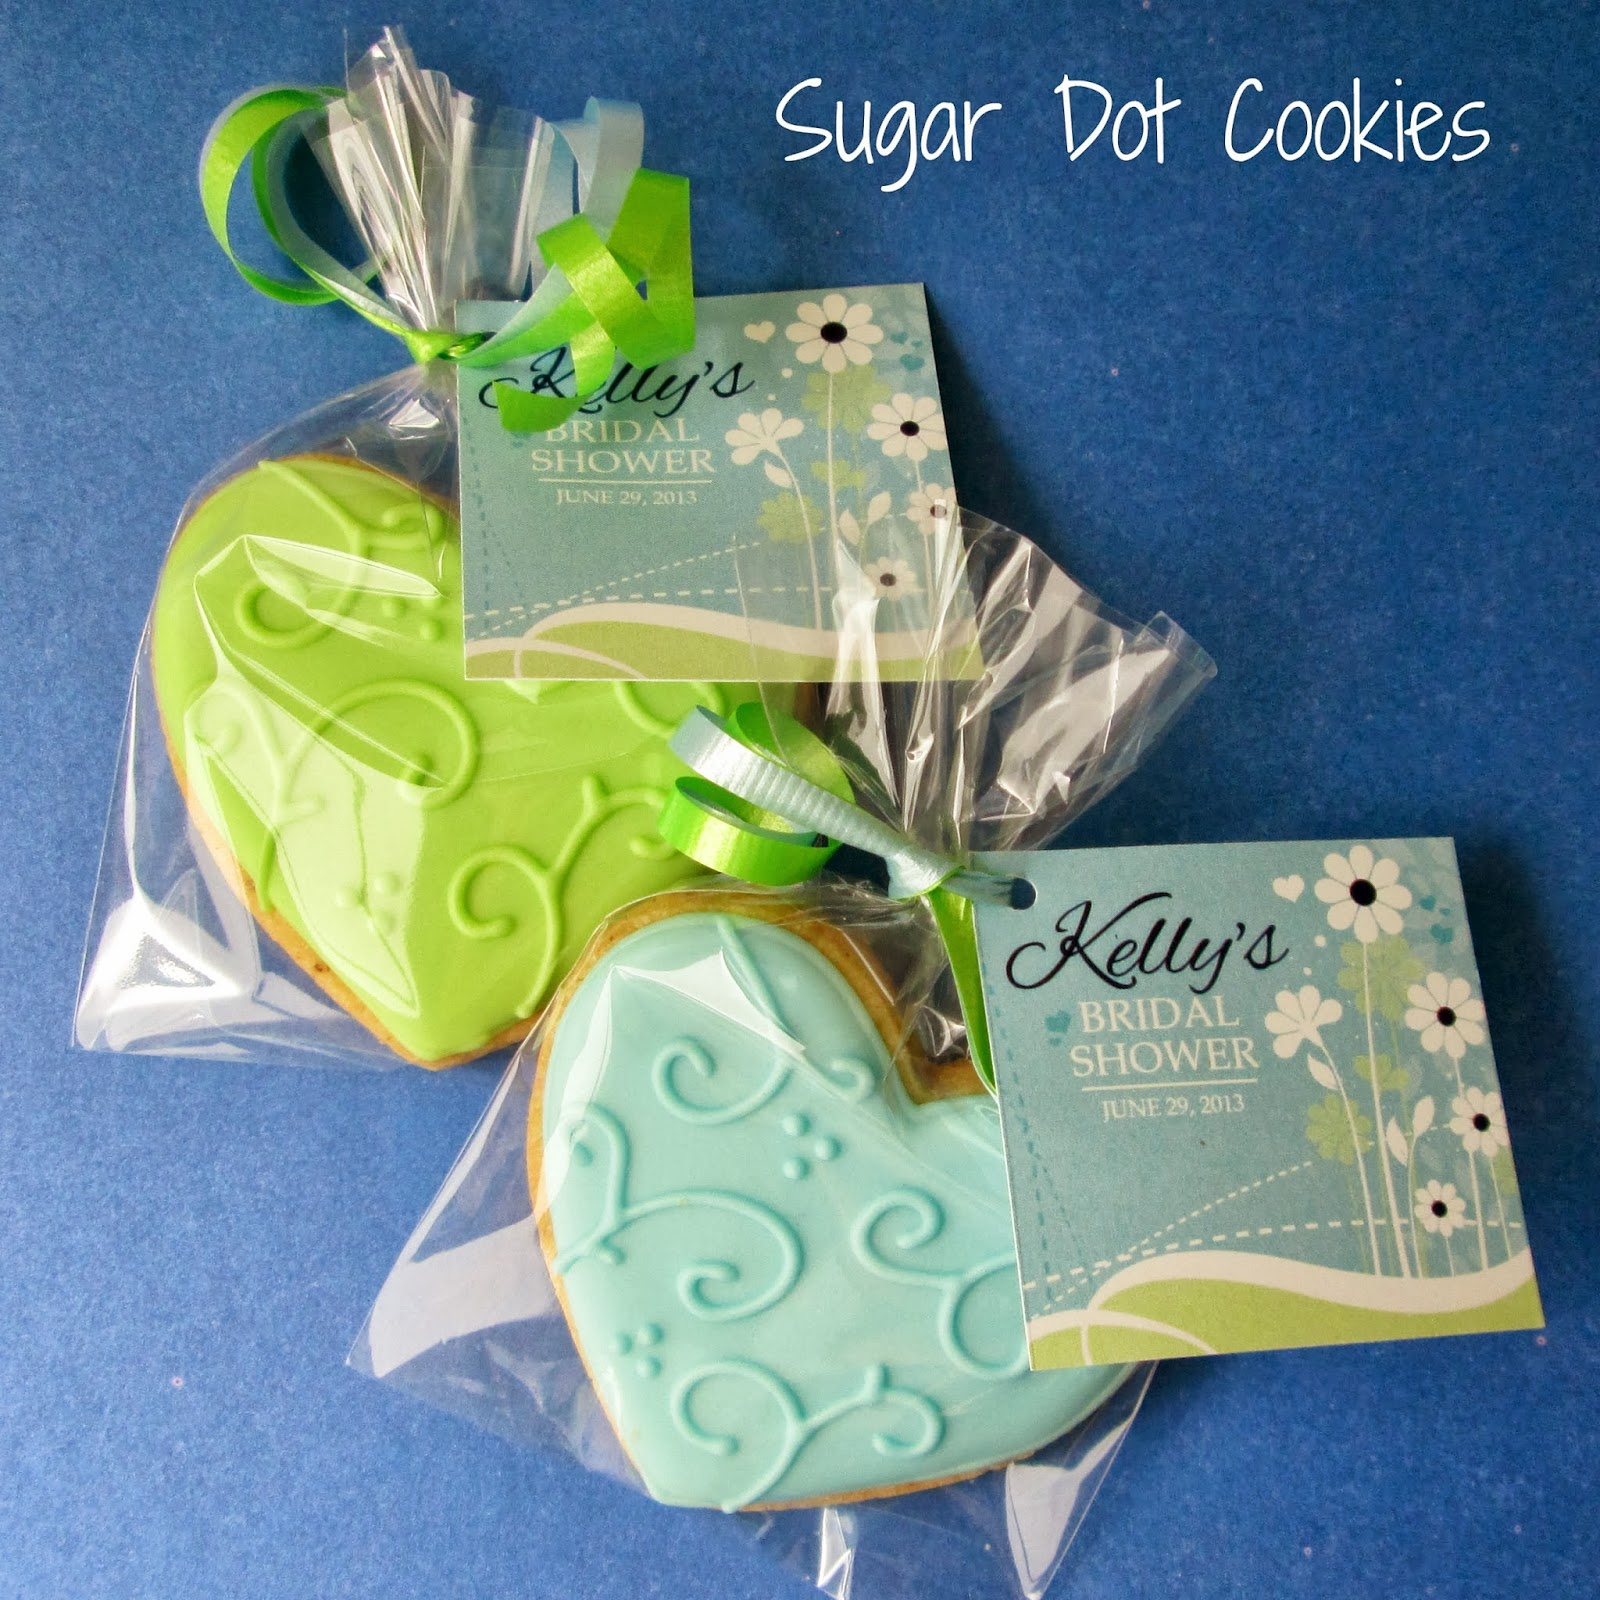 Sugar Dot Cookies 2013